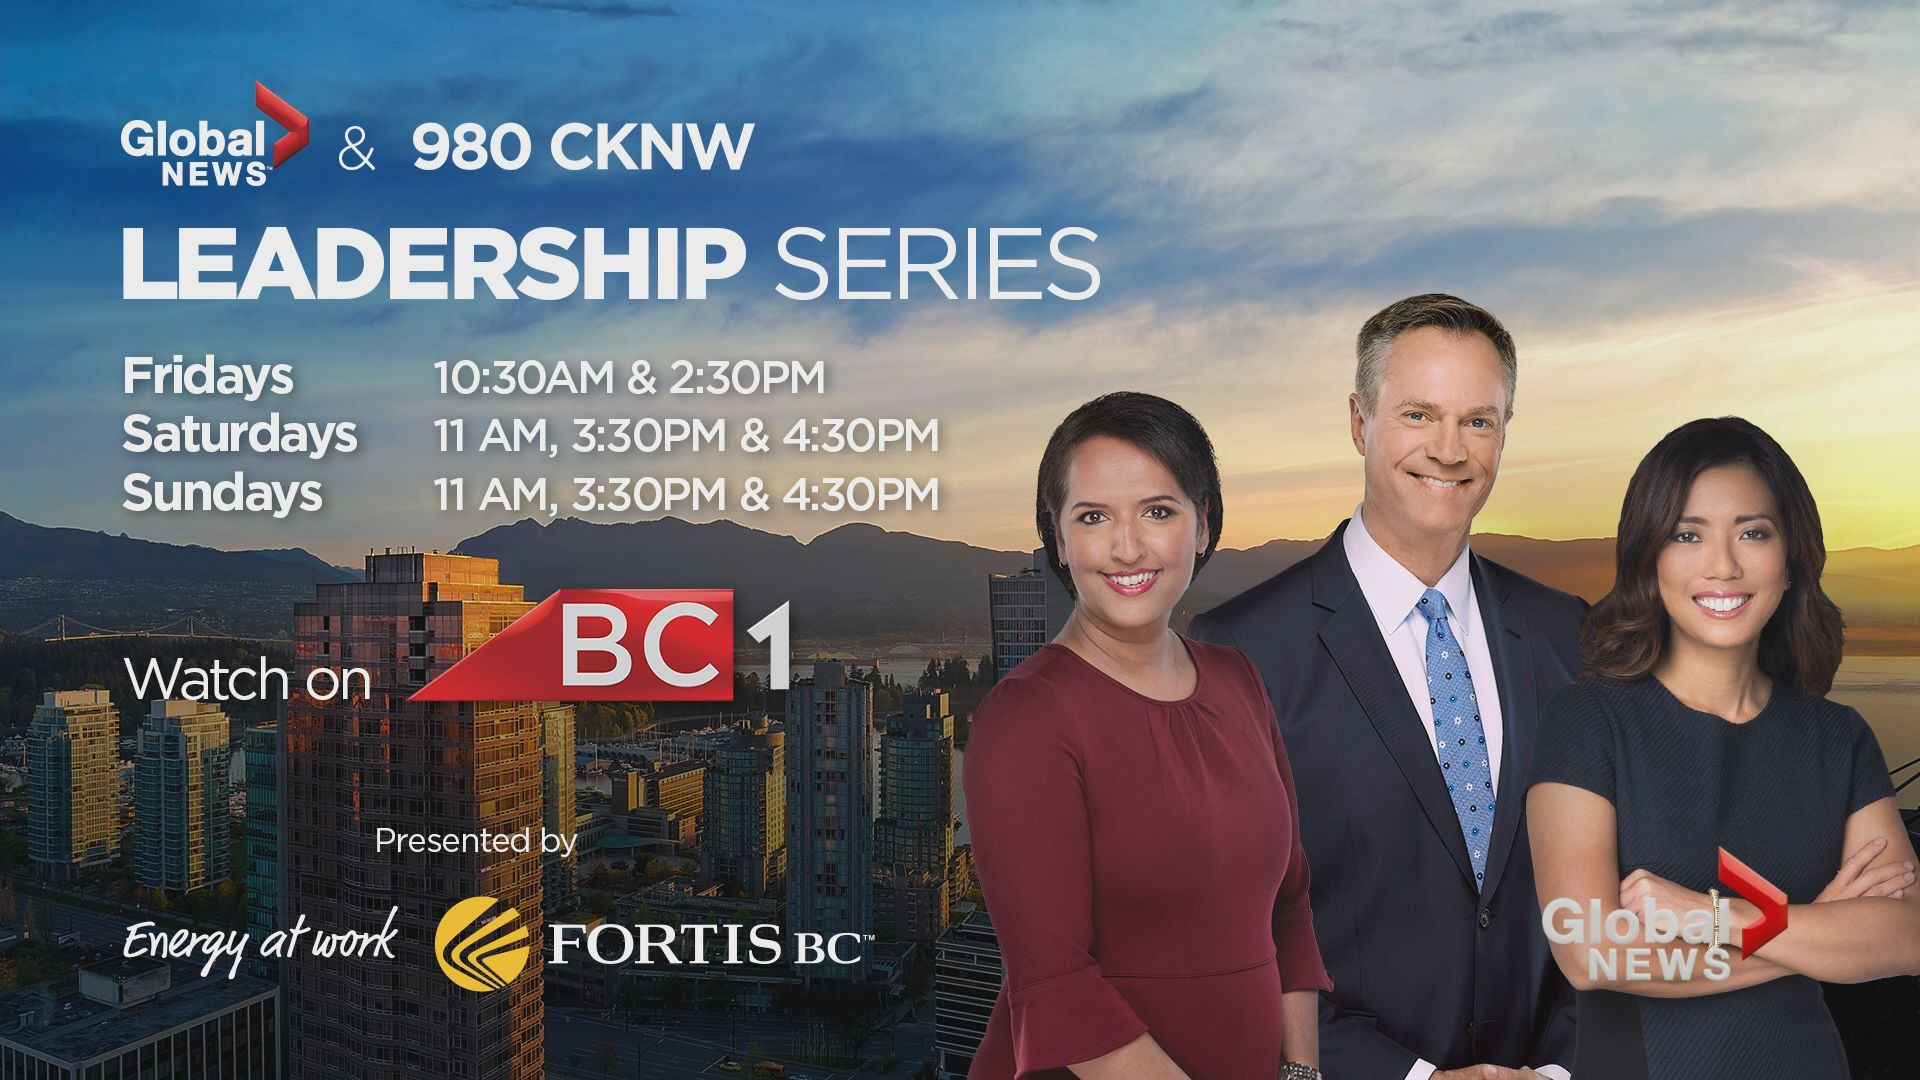 Global News & 980 Leadership series returns for 2019